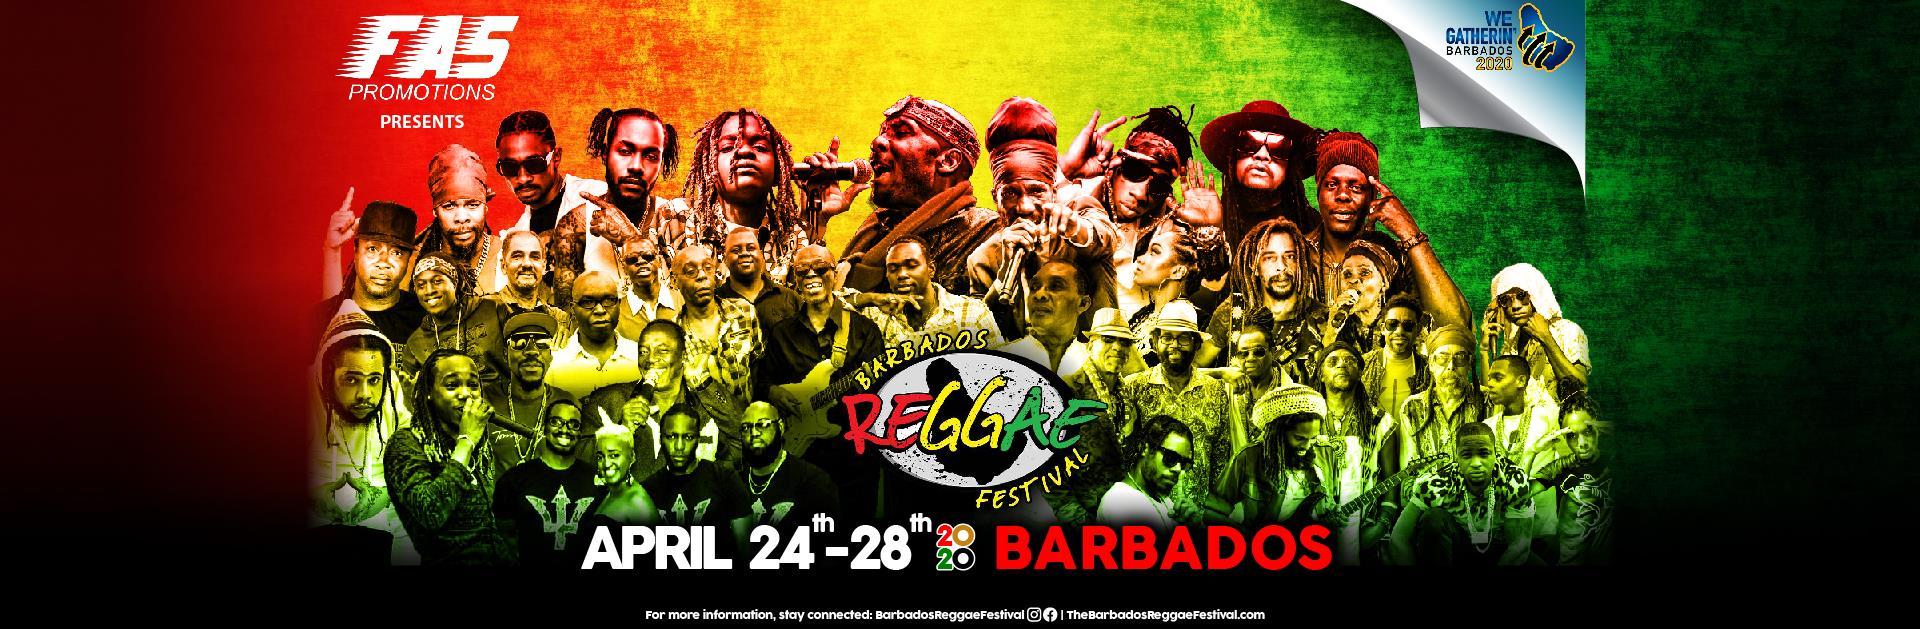 barbados reggae festival 2020